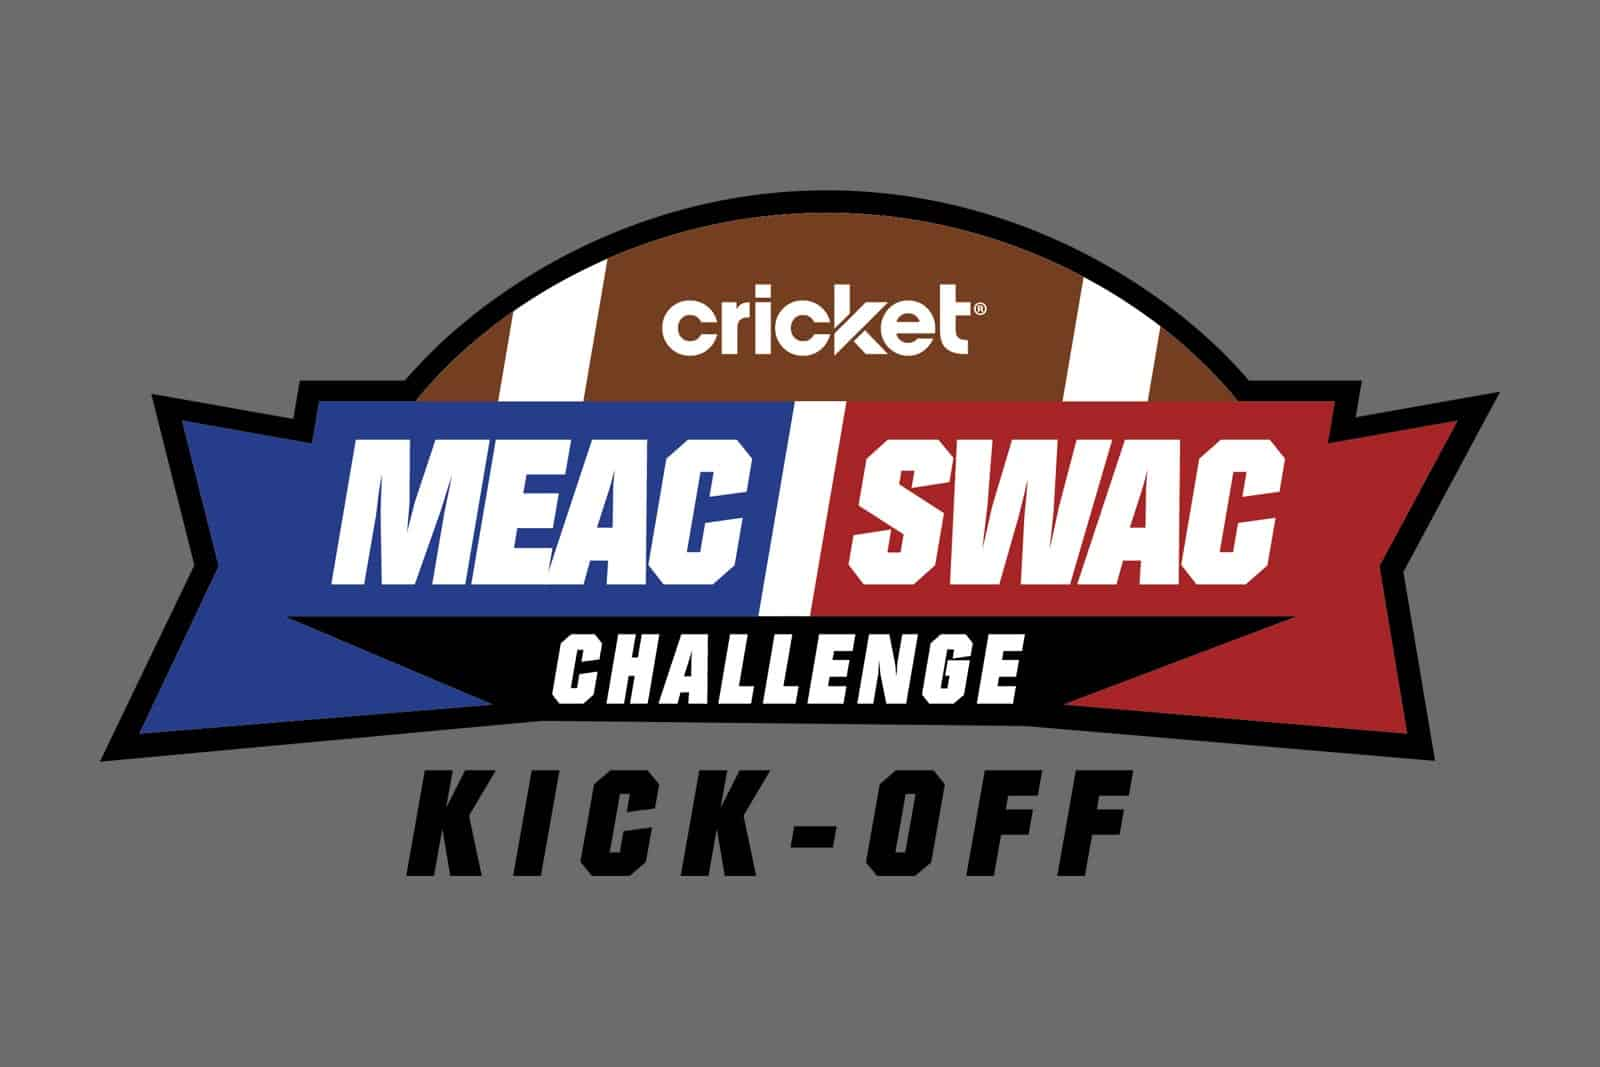 MEAC/SWAC Challenge Kickoff